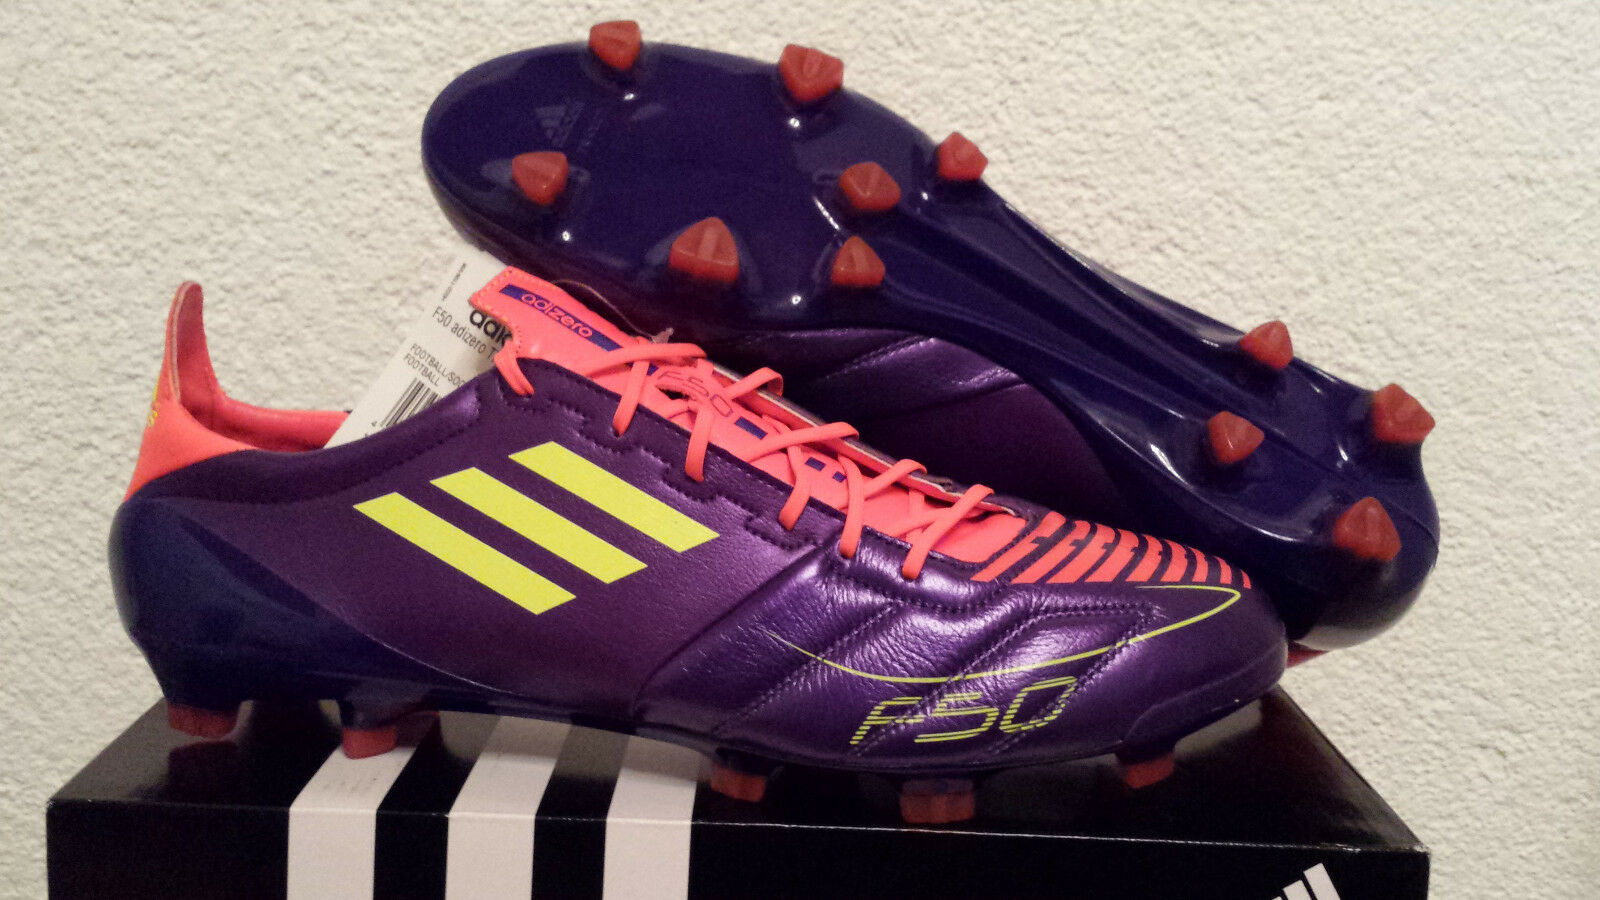 Nuevo adidas f50 ADIZERO TRX FG cuero 12 UE 47 1 3 botas de fútbol rare Projoator